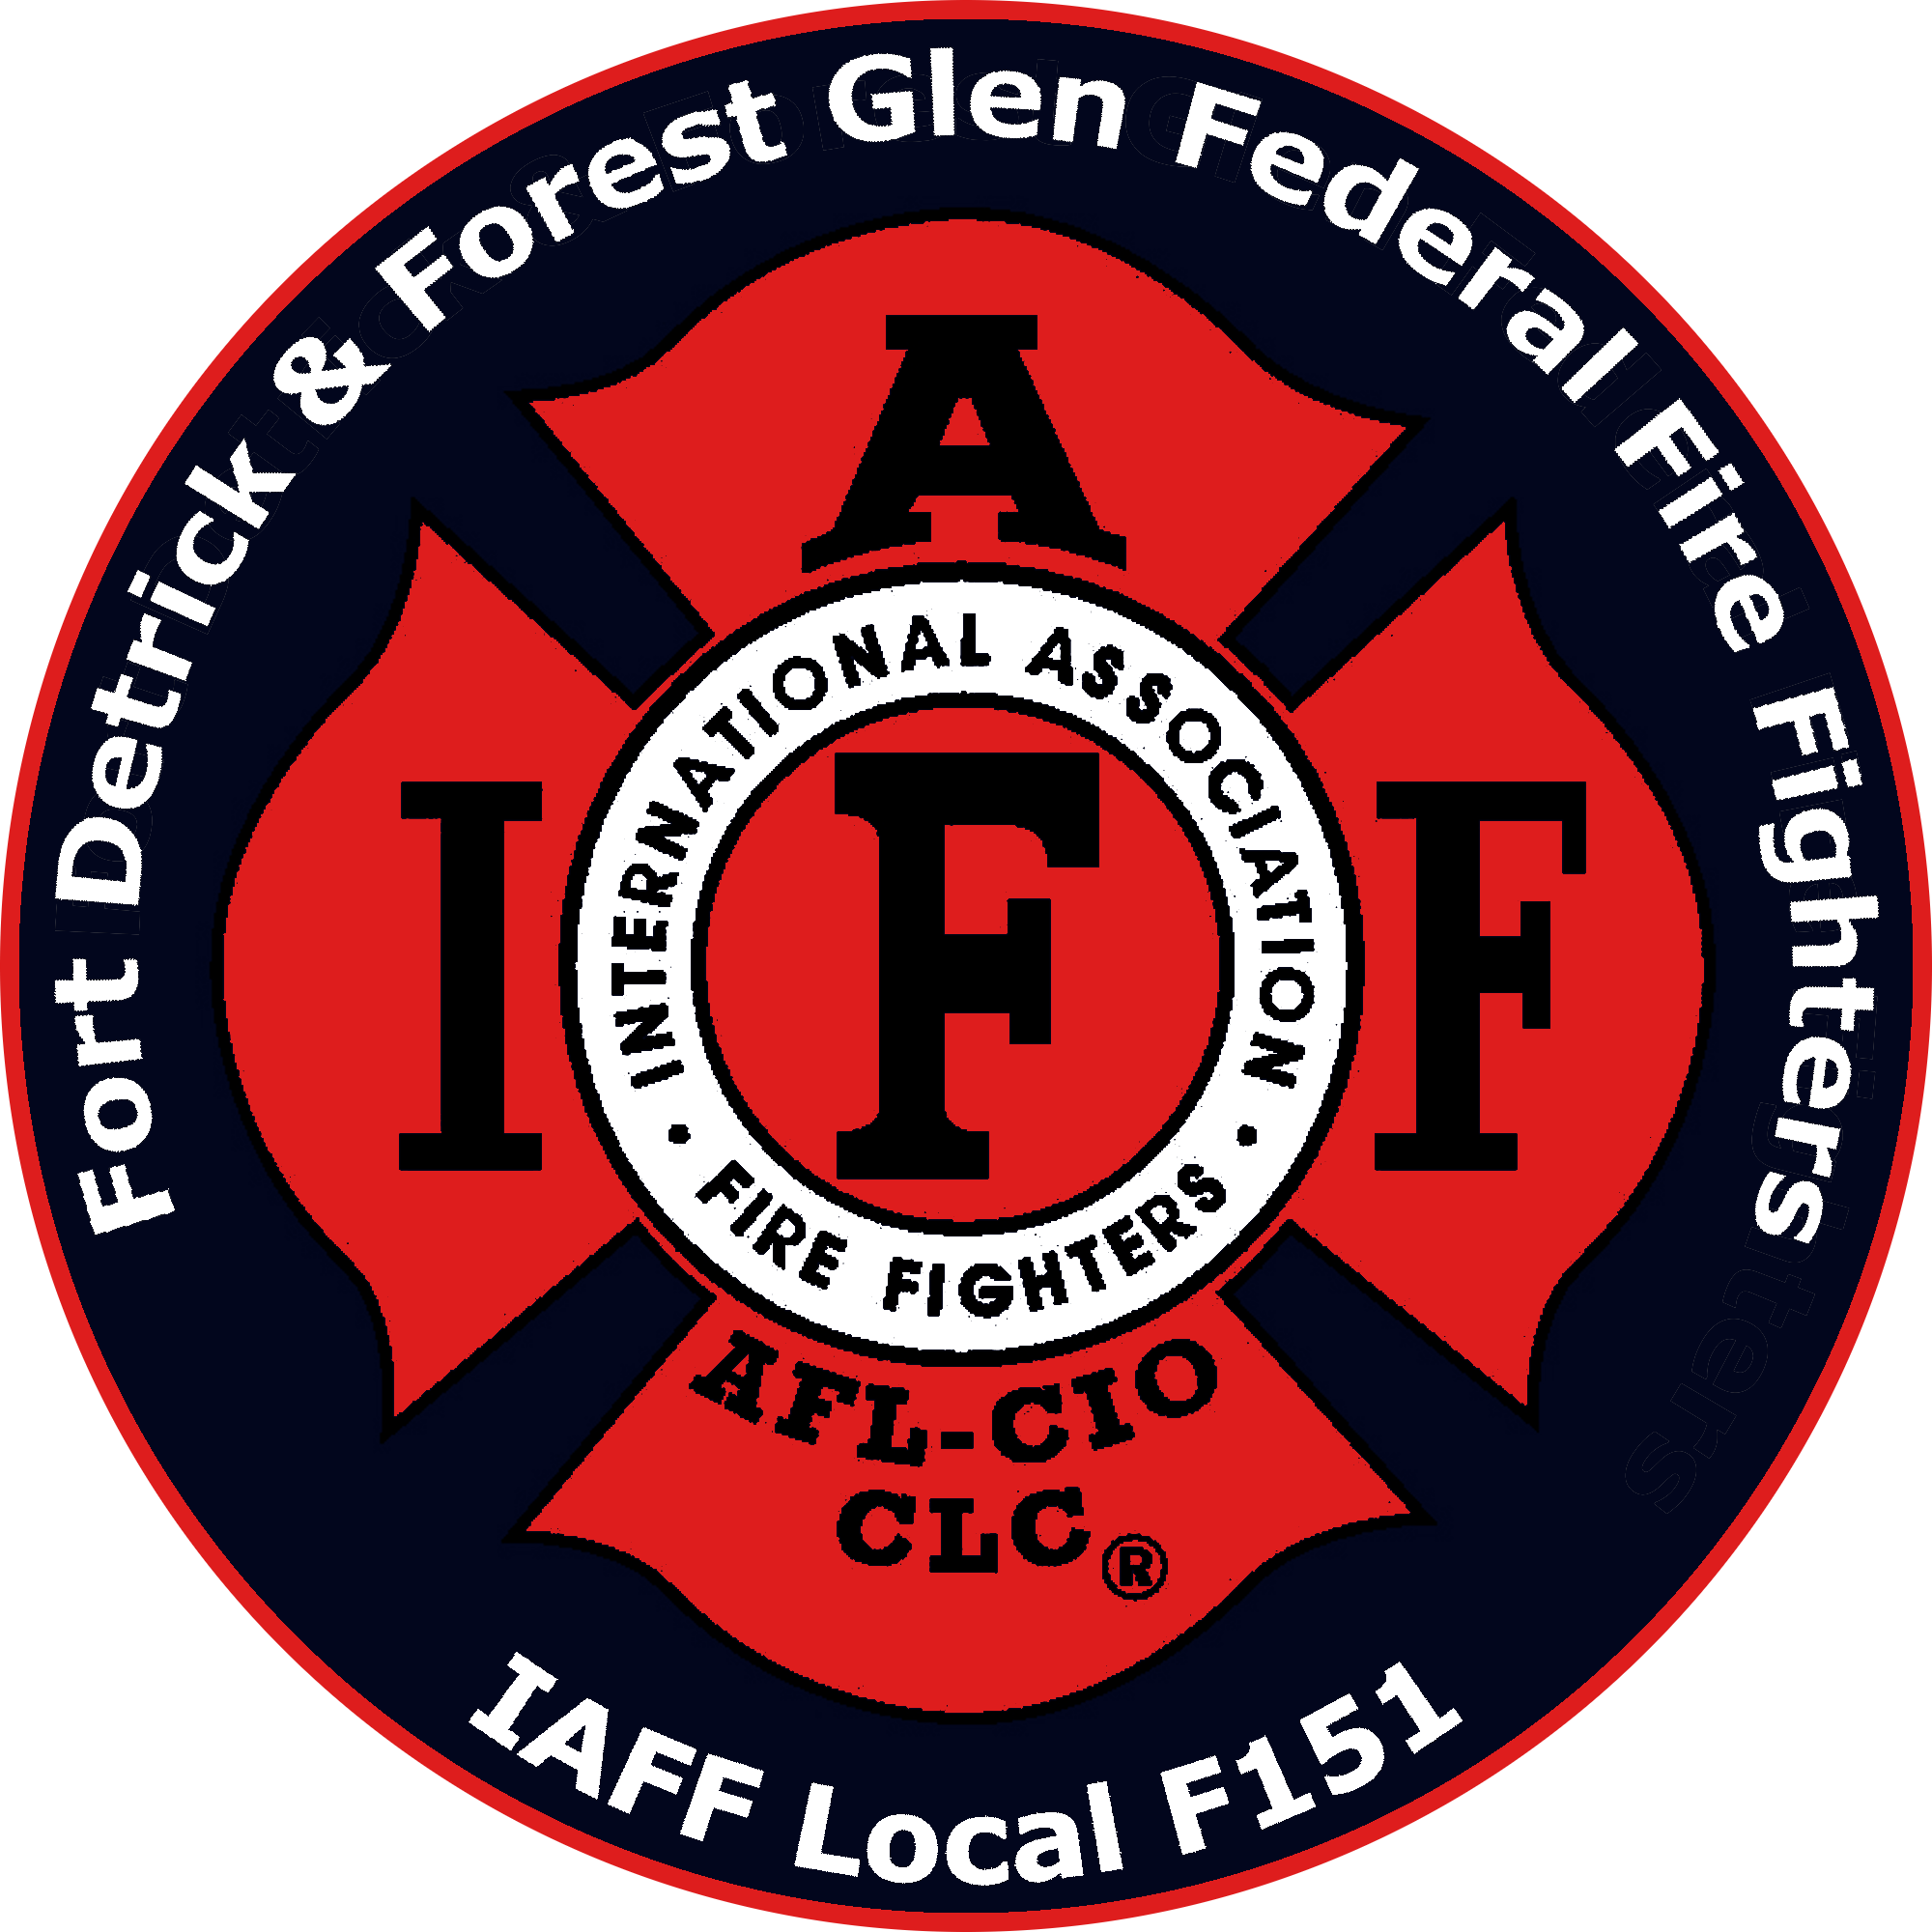 IAFF Local F151 (@iaff151) | Twitter